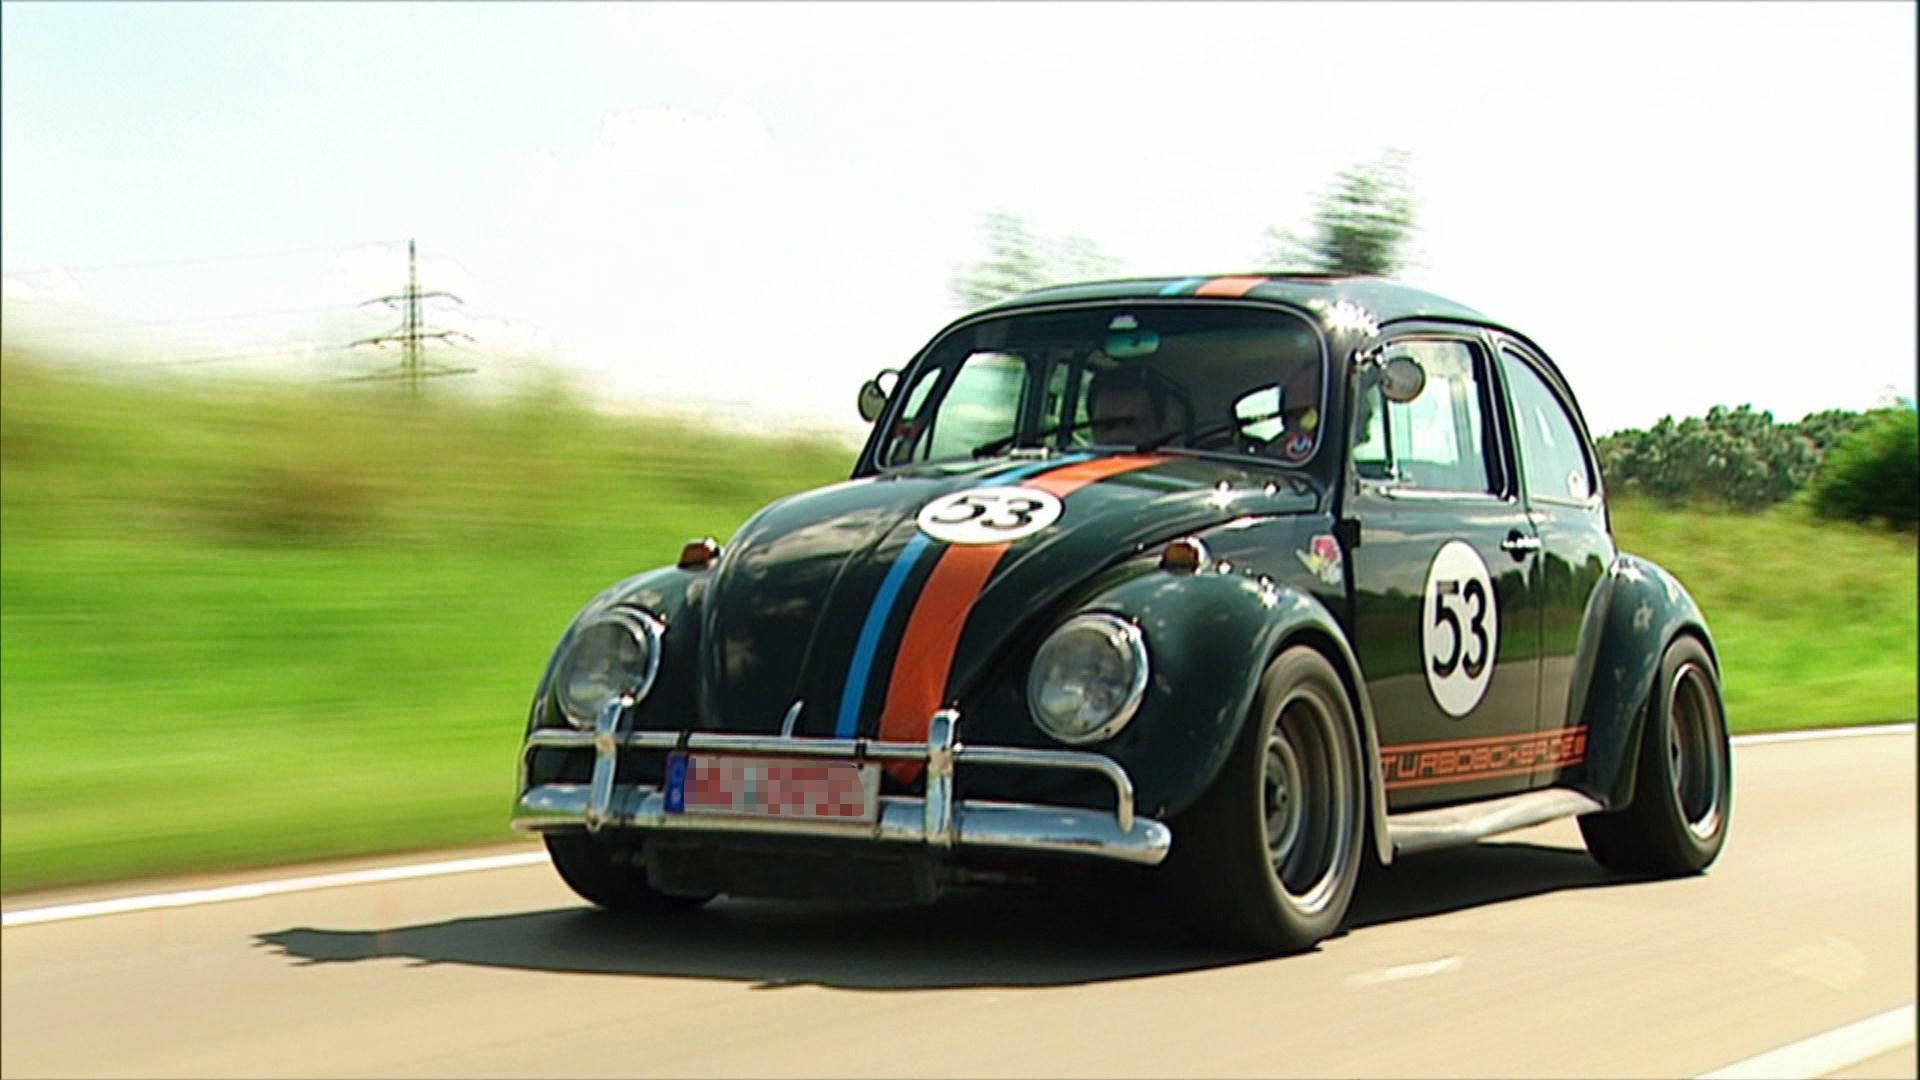 Res: 1920x1080, VW Käfer Herbie vs. De Tomaso Pantera (Folge 10) - GRIP EXTREM - RTL 2    www.rtl2.de